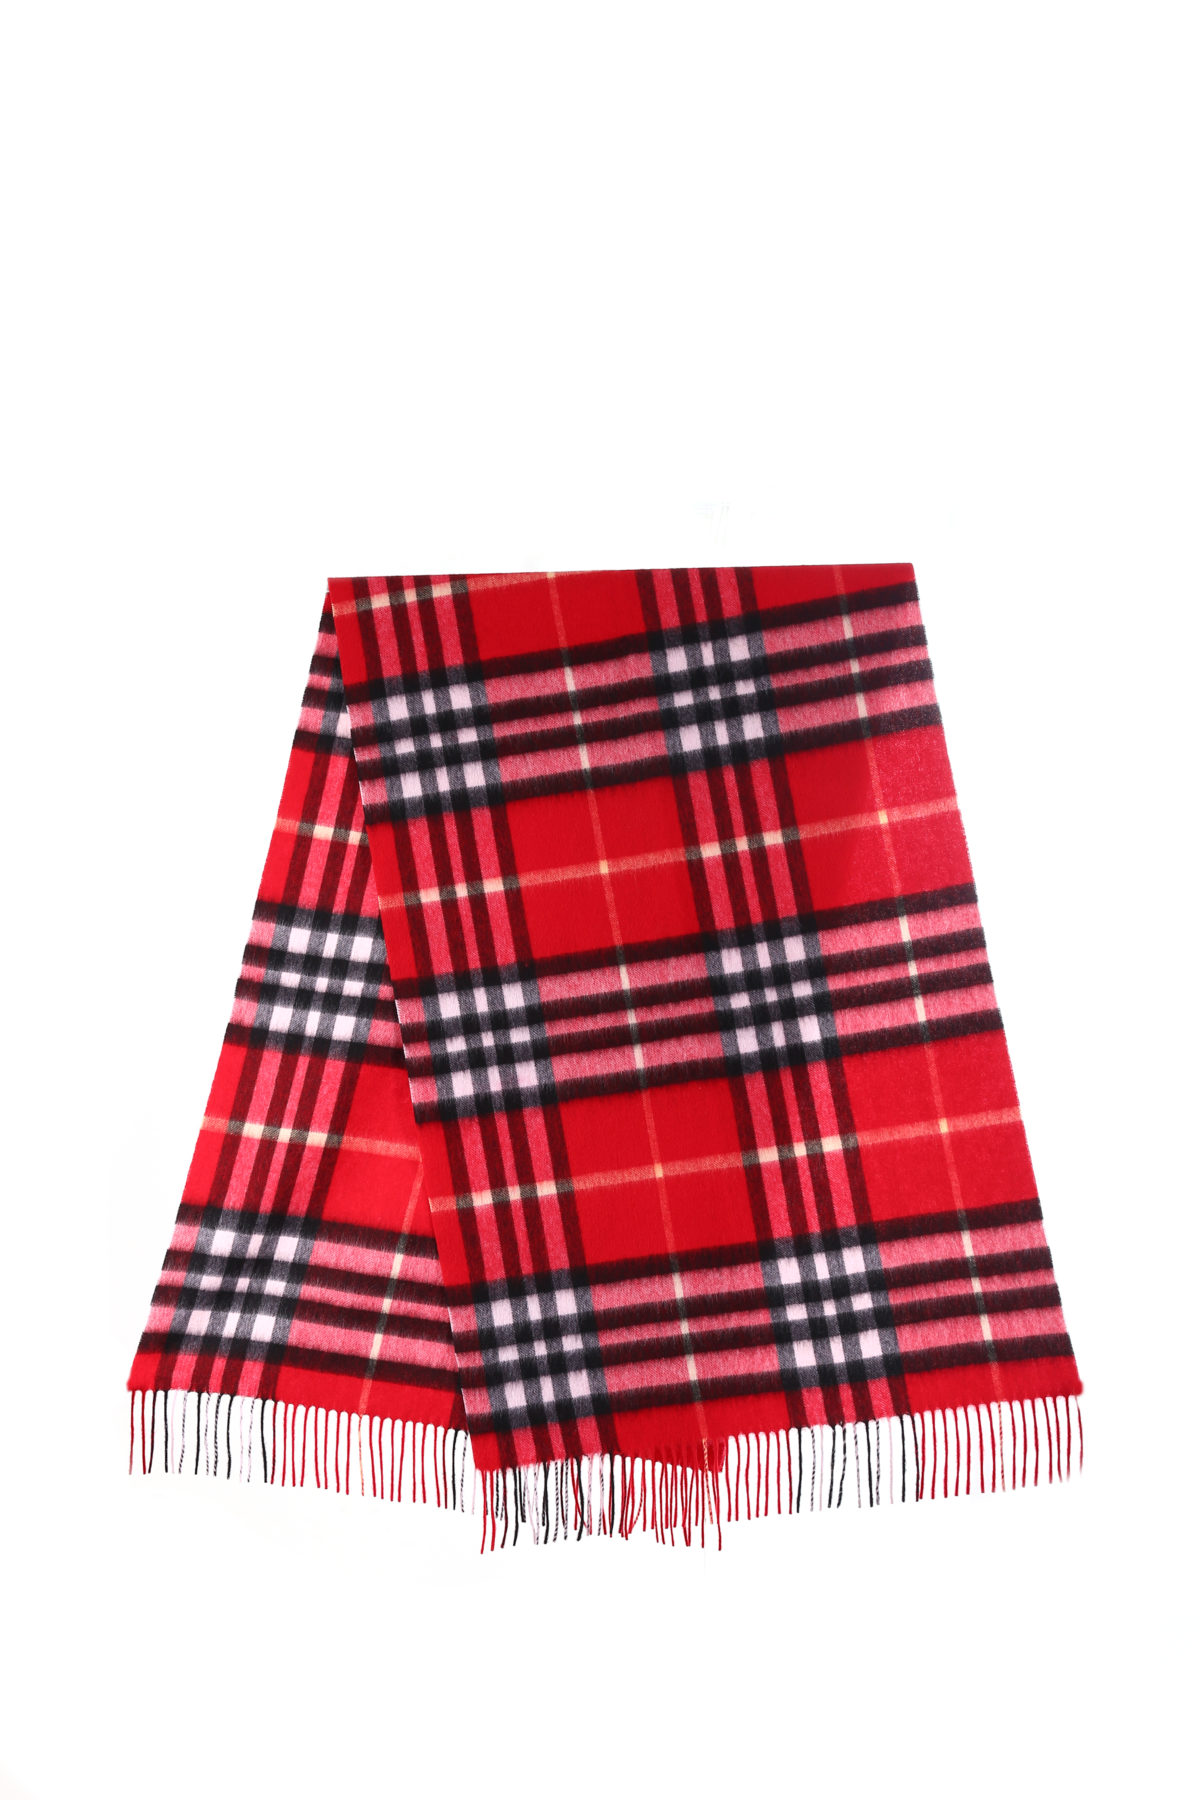 Edinburgh Lambswool Blanket